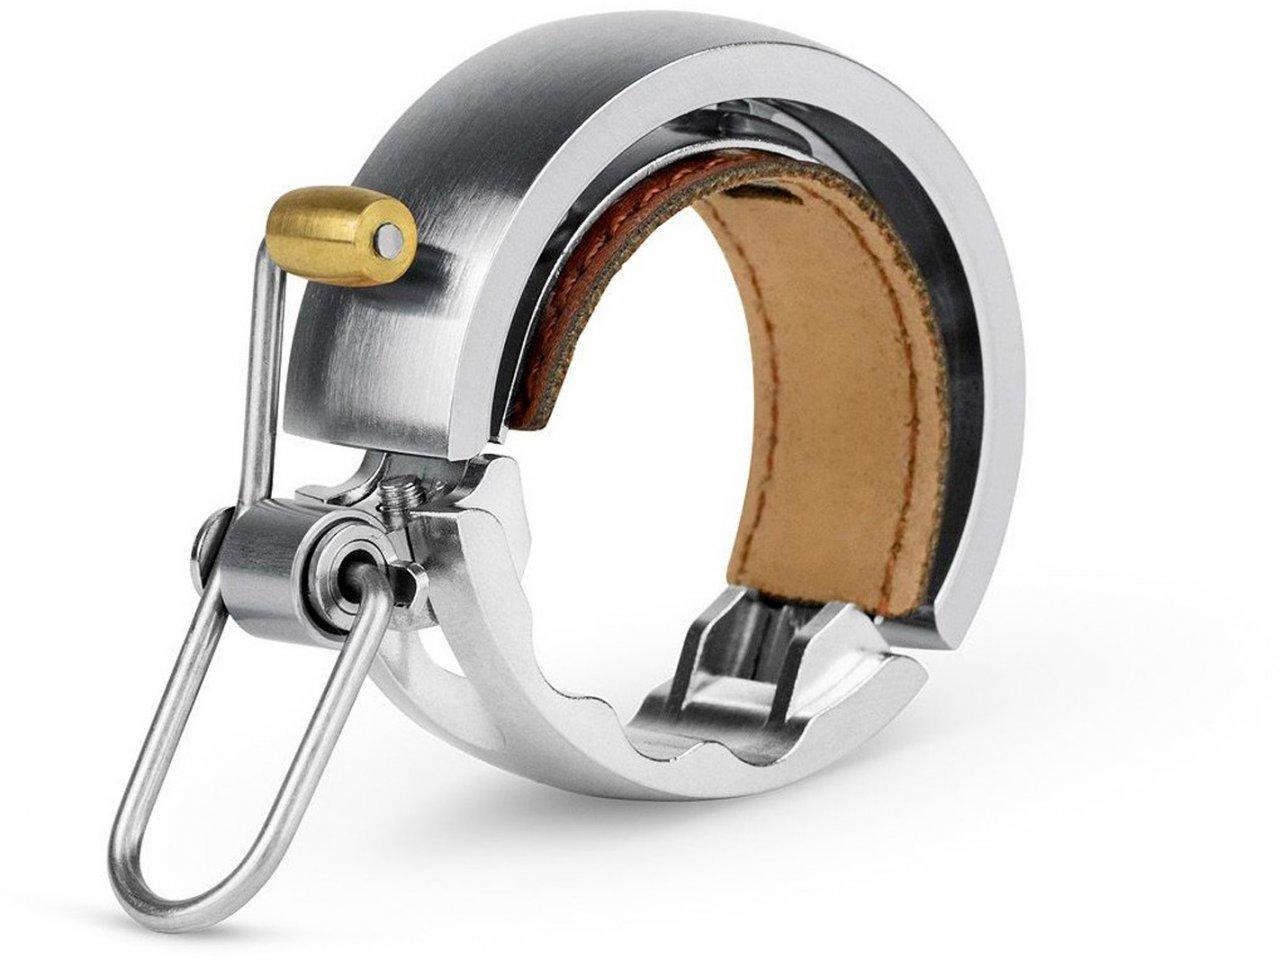 Knog Oi Luxe Large 23,8 - 31,8mm Fahrradklingel